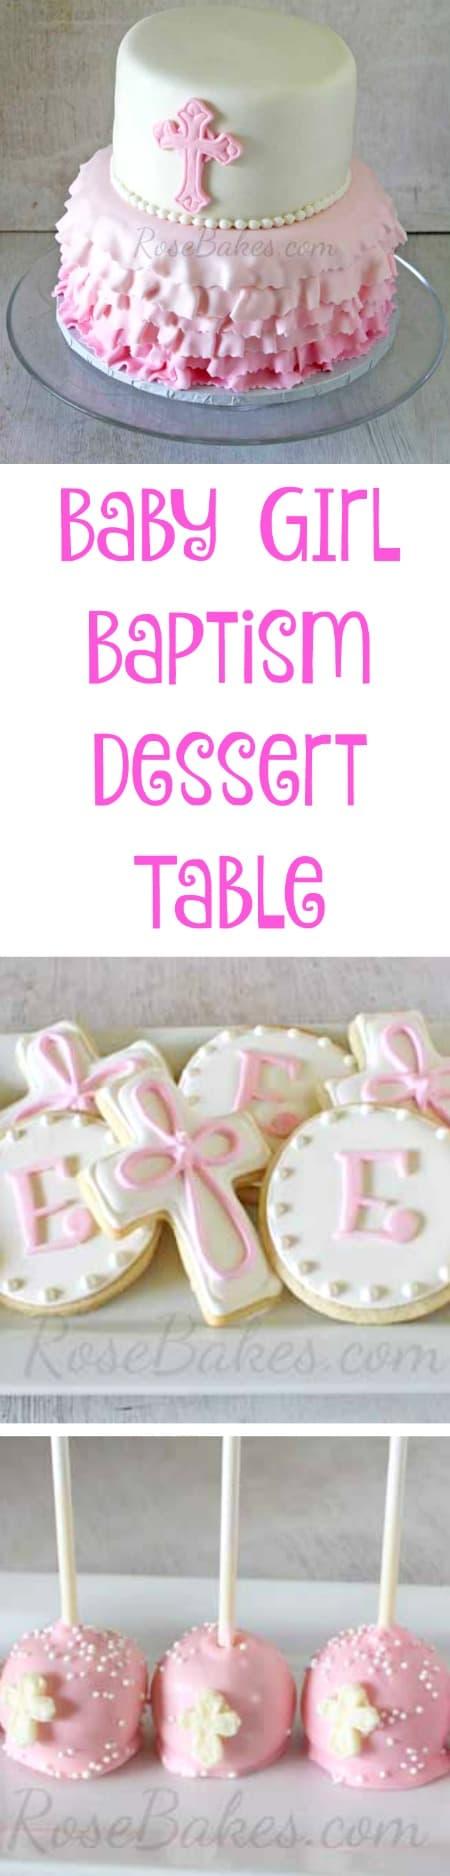 Baby Girl Baptism Dessert Table by Rose Bakes